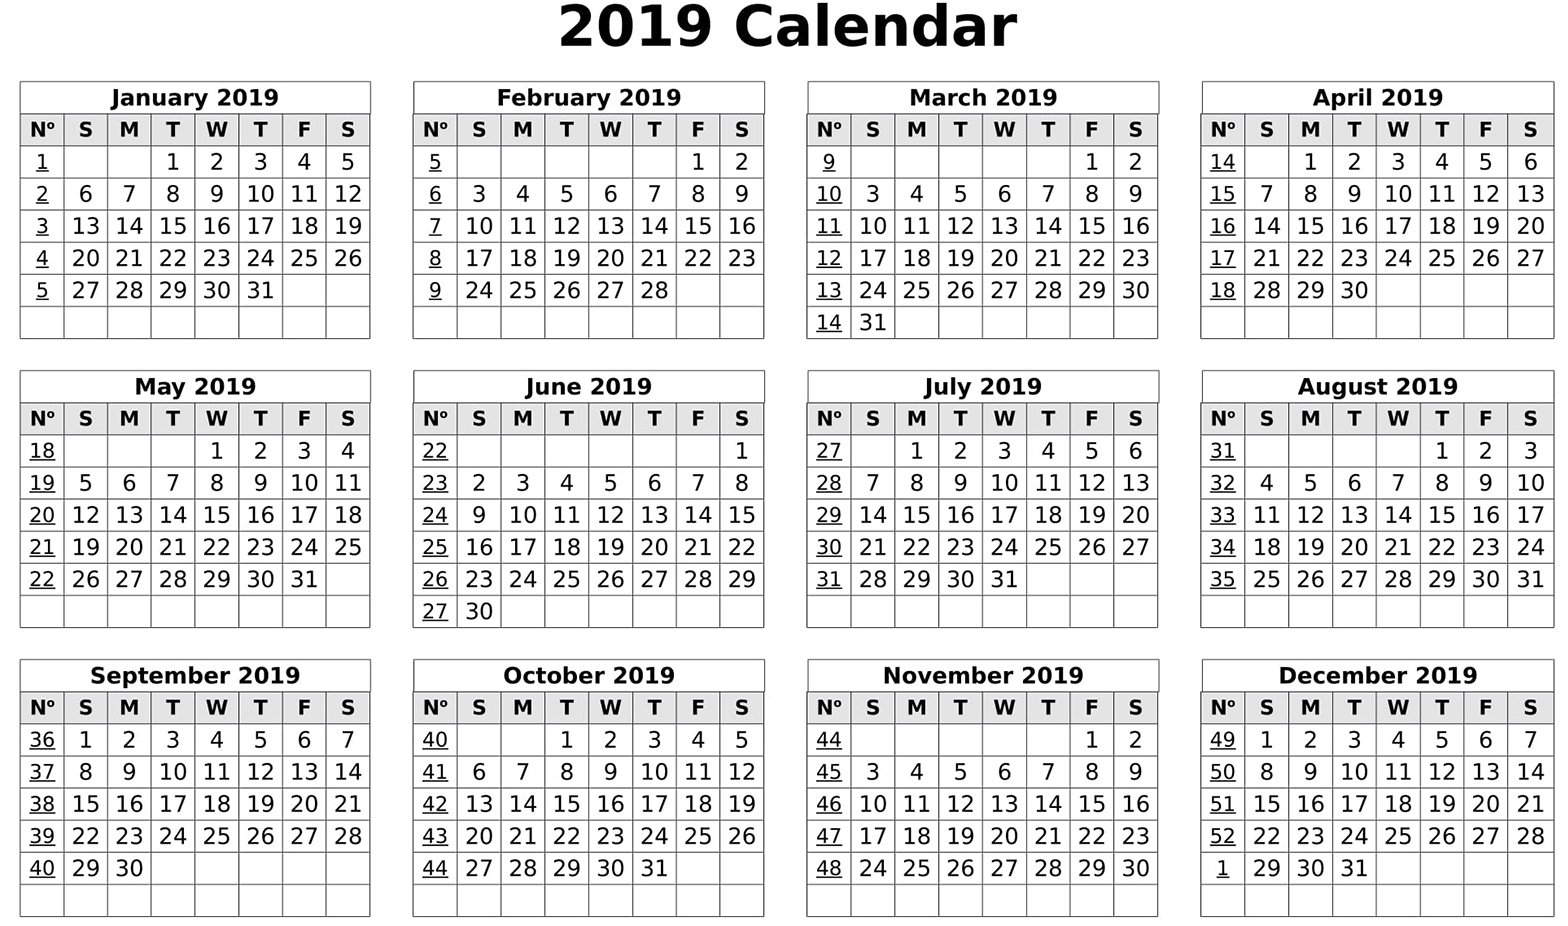 Calendar 2019 Print Out | Free Printable 2019 Calendar Template Word Calendar 2019 Excel With Week Numbers